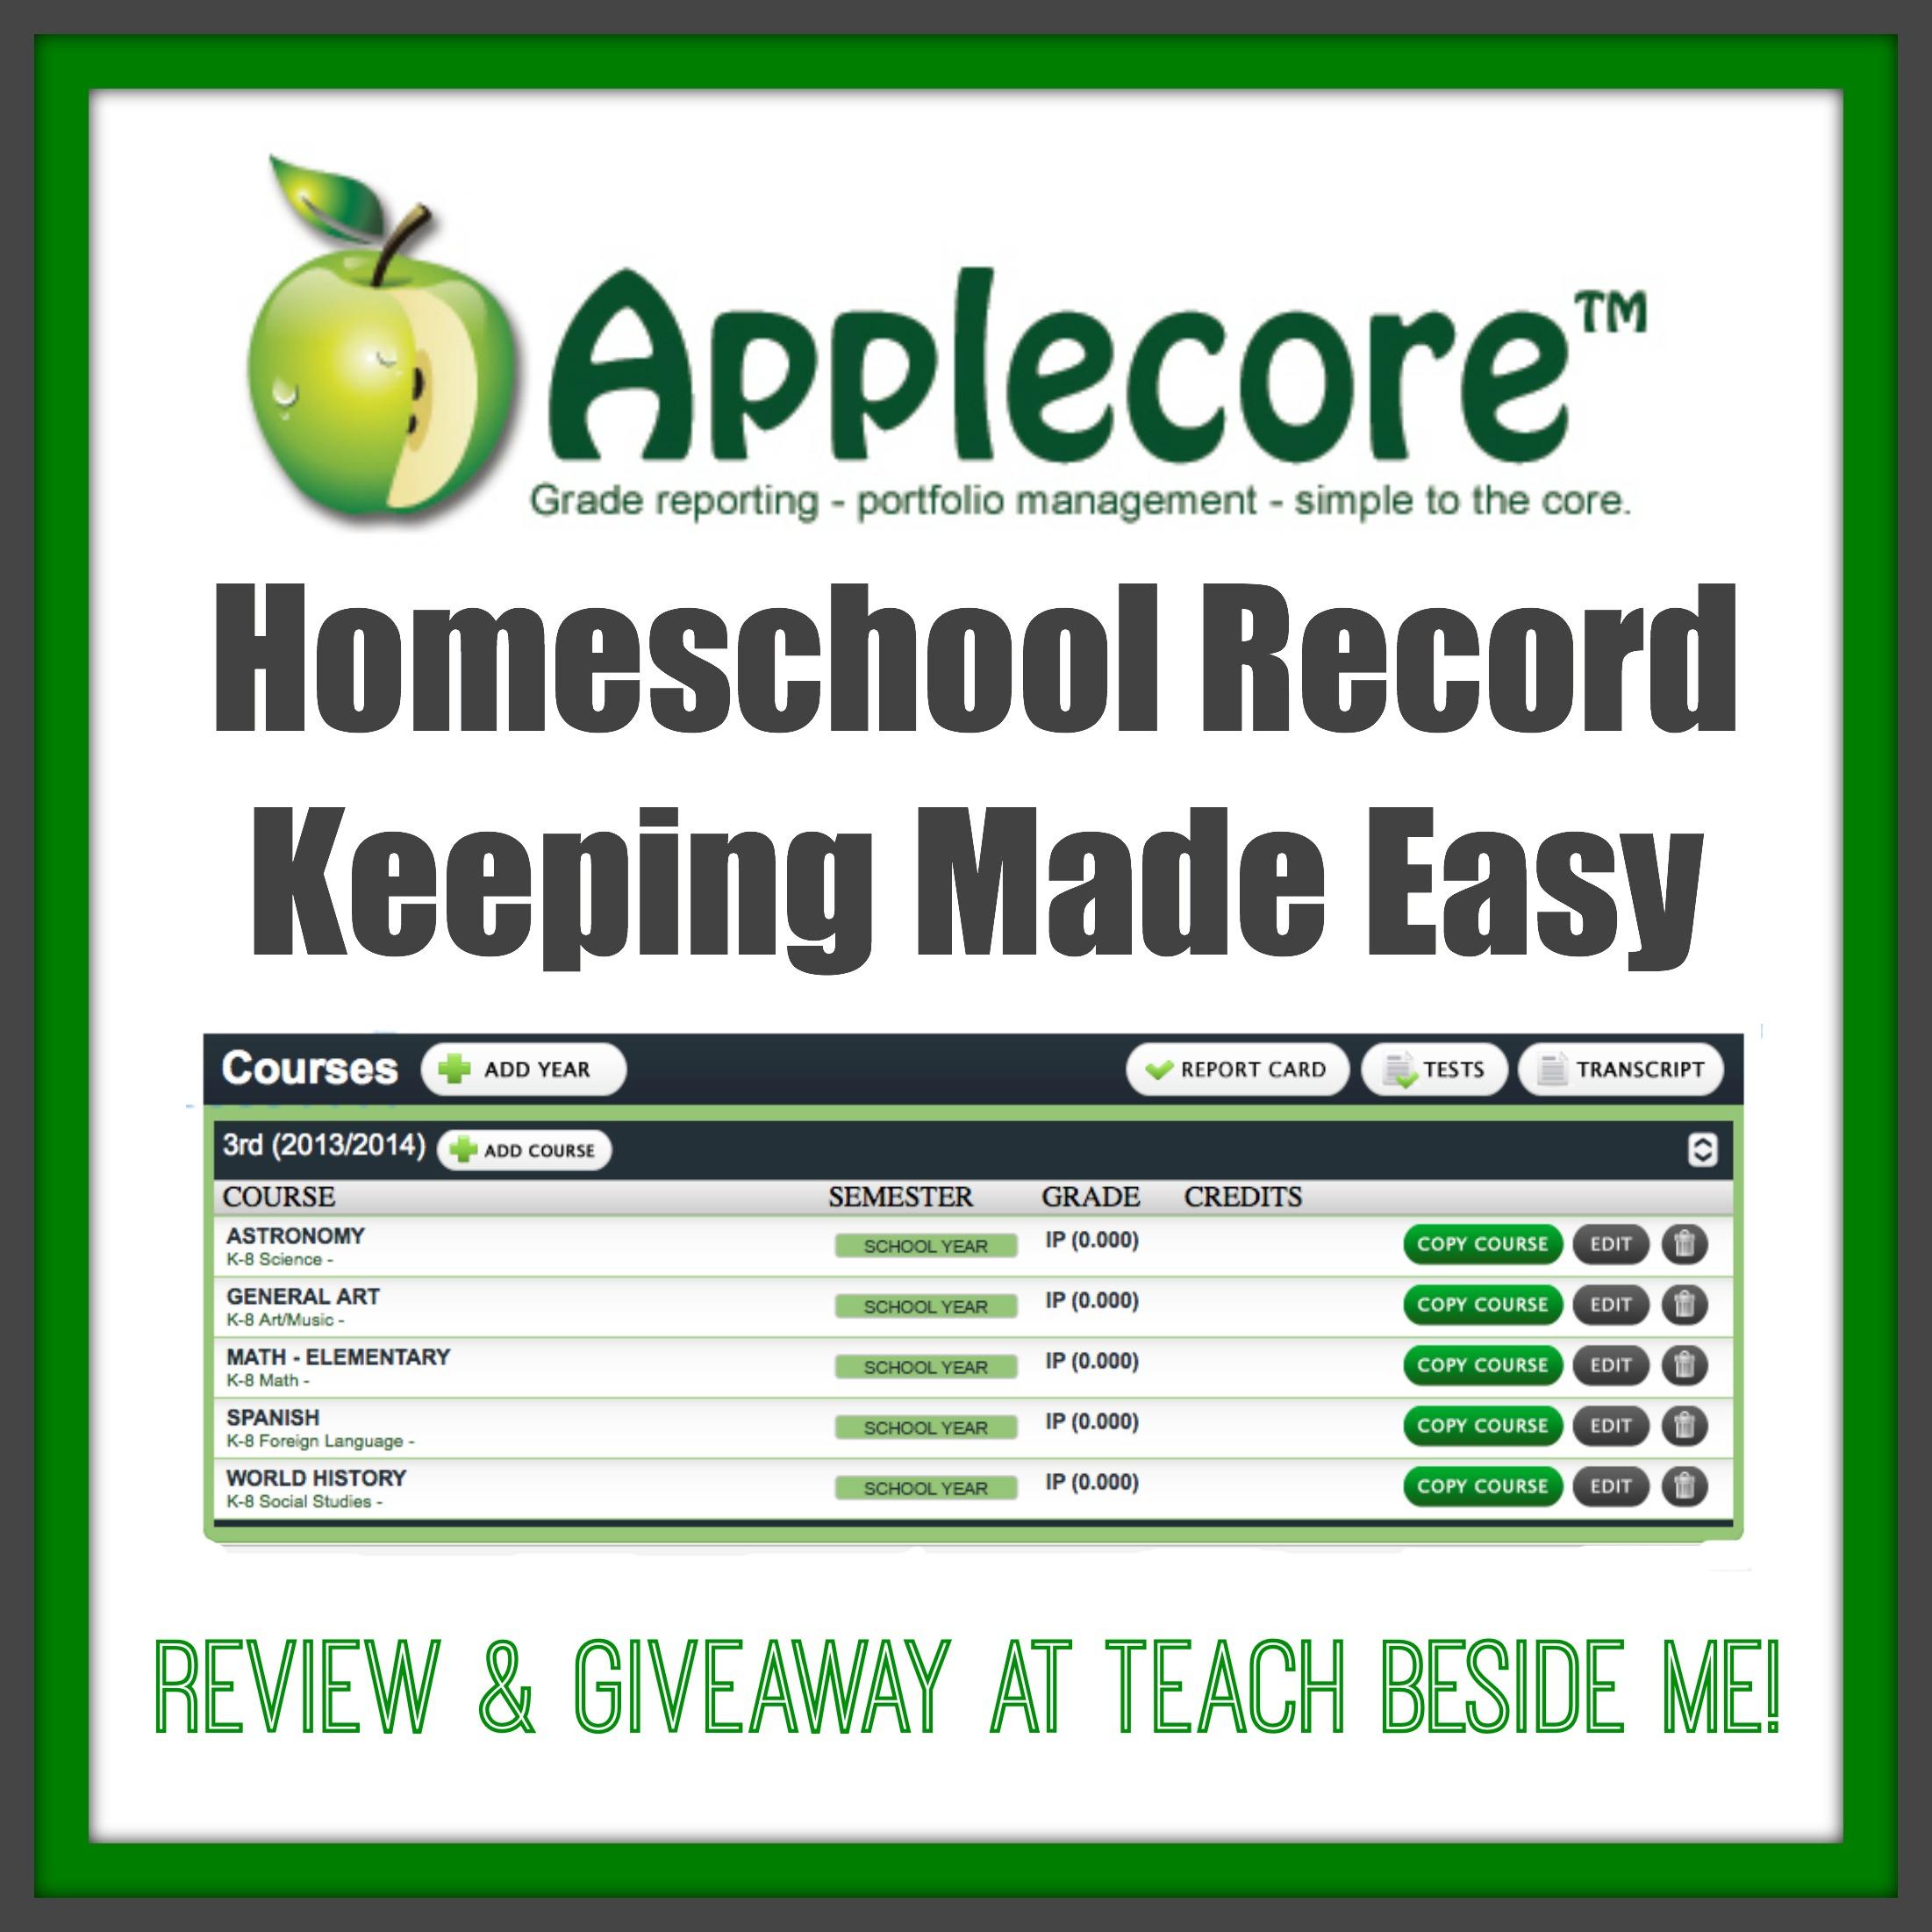 applecore homeschool record keeping teach beside me